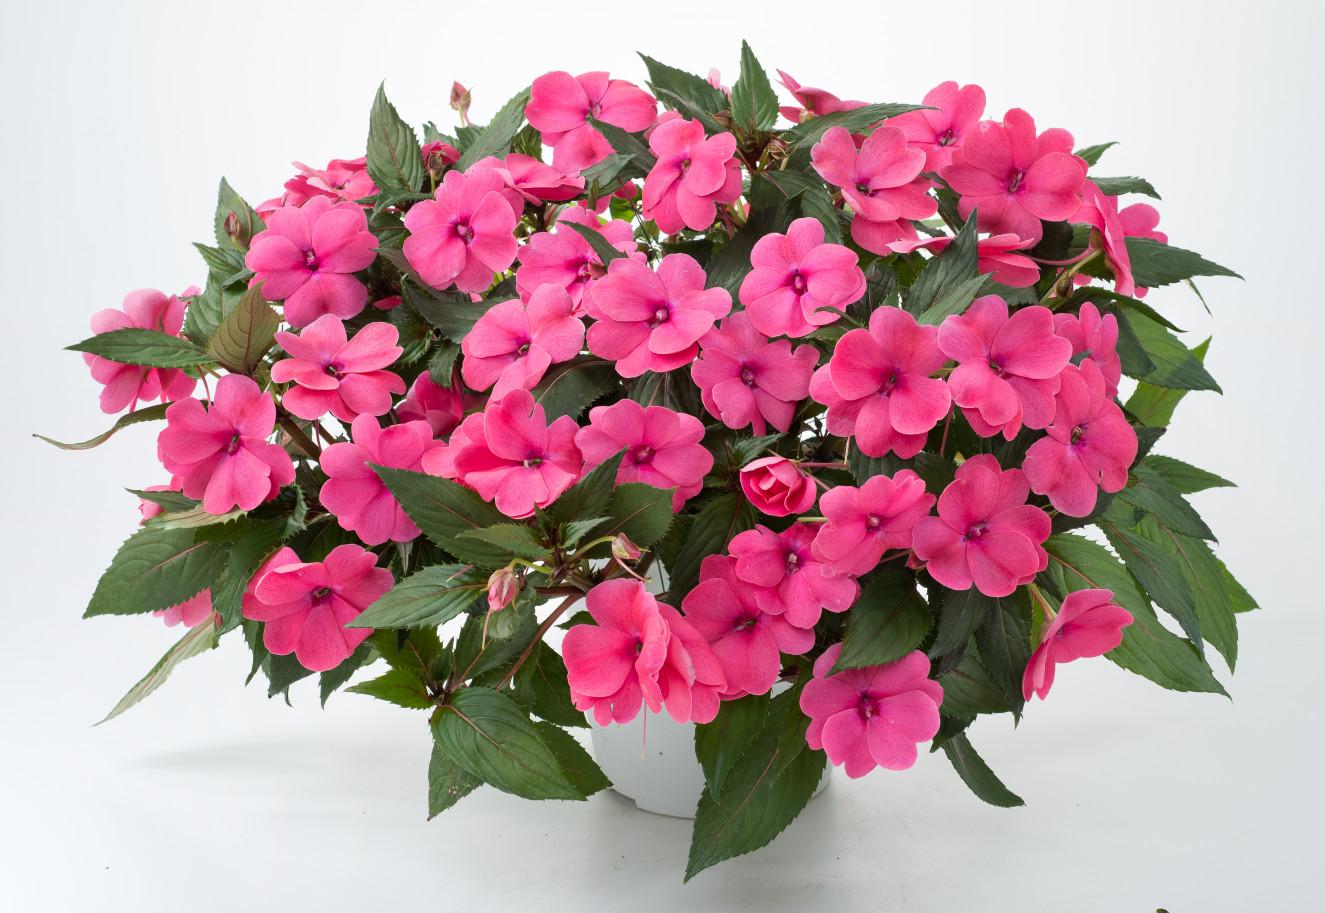 Sun Harmony™ Deep Pink- bm-12-169-dan-1342-Edit(14-15).jpg